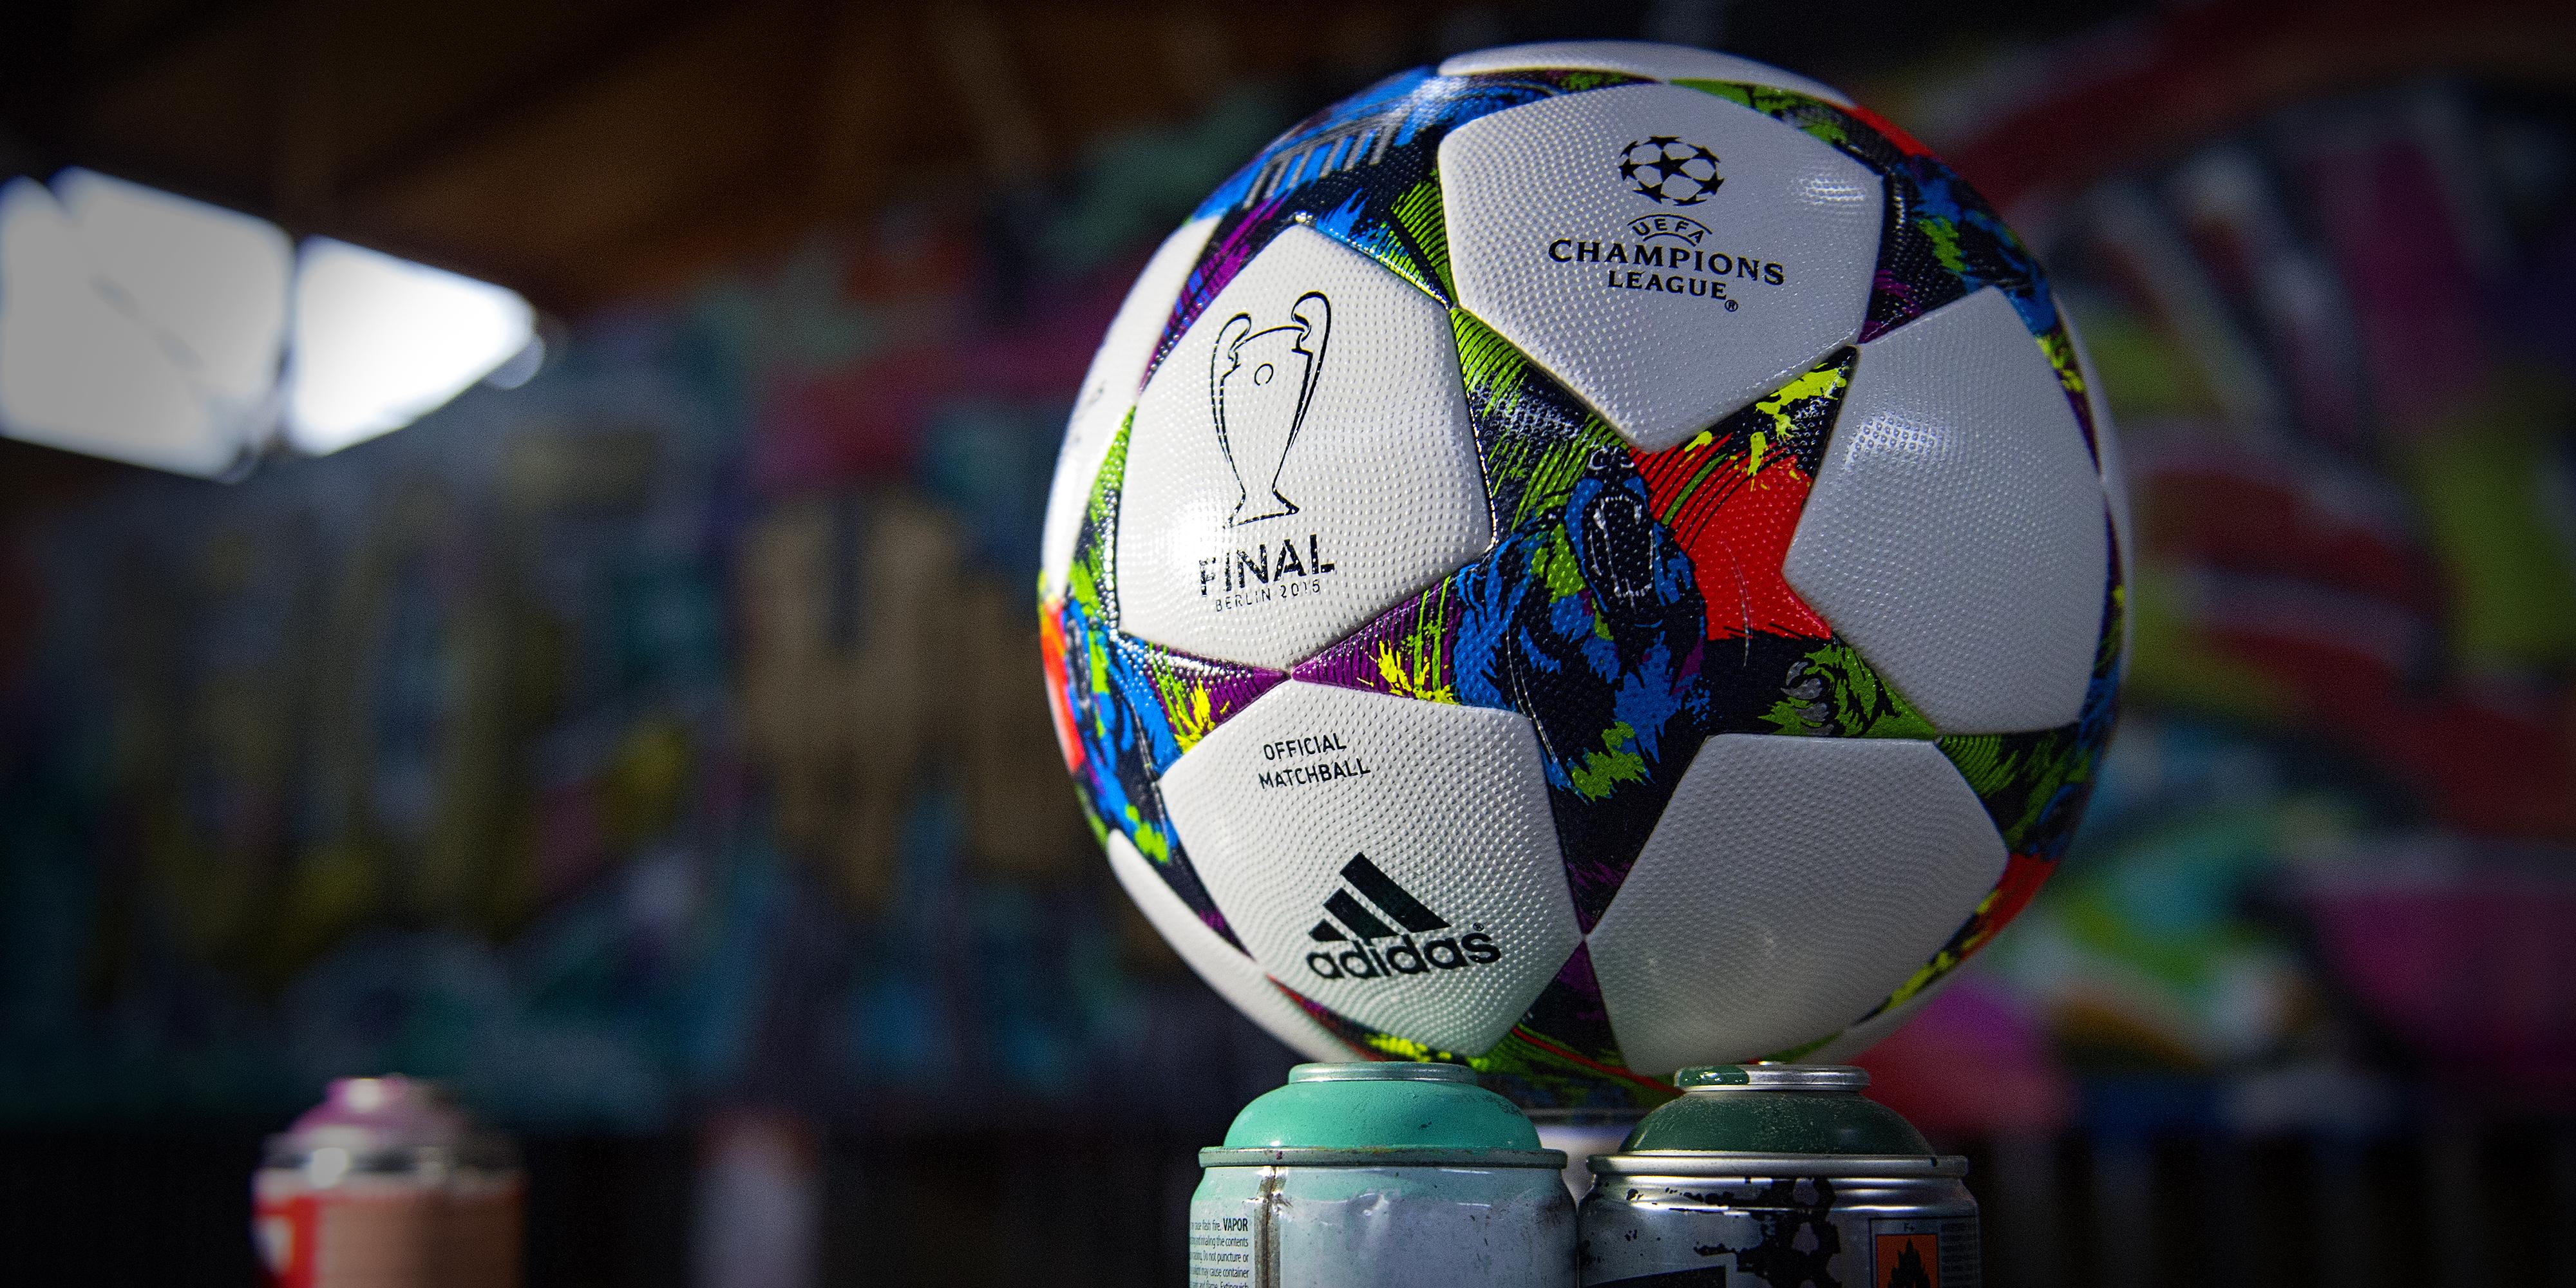 мяч спорт EURO 2016 adidas  № 3918574 бесплатно